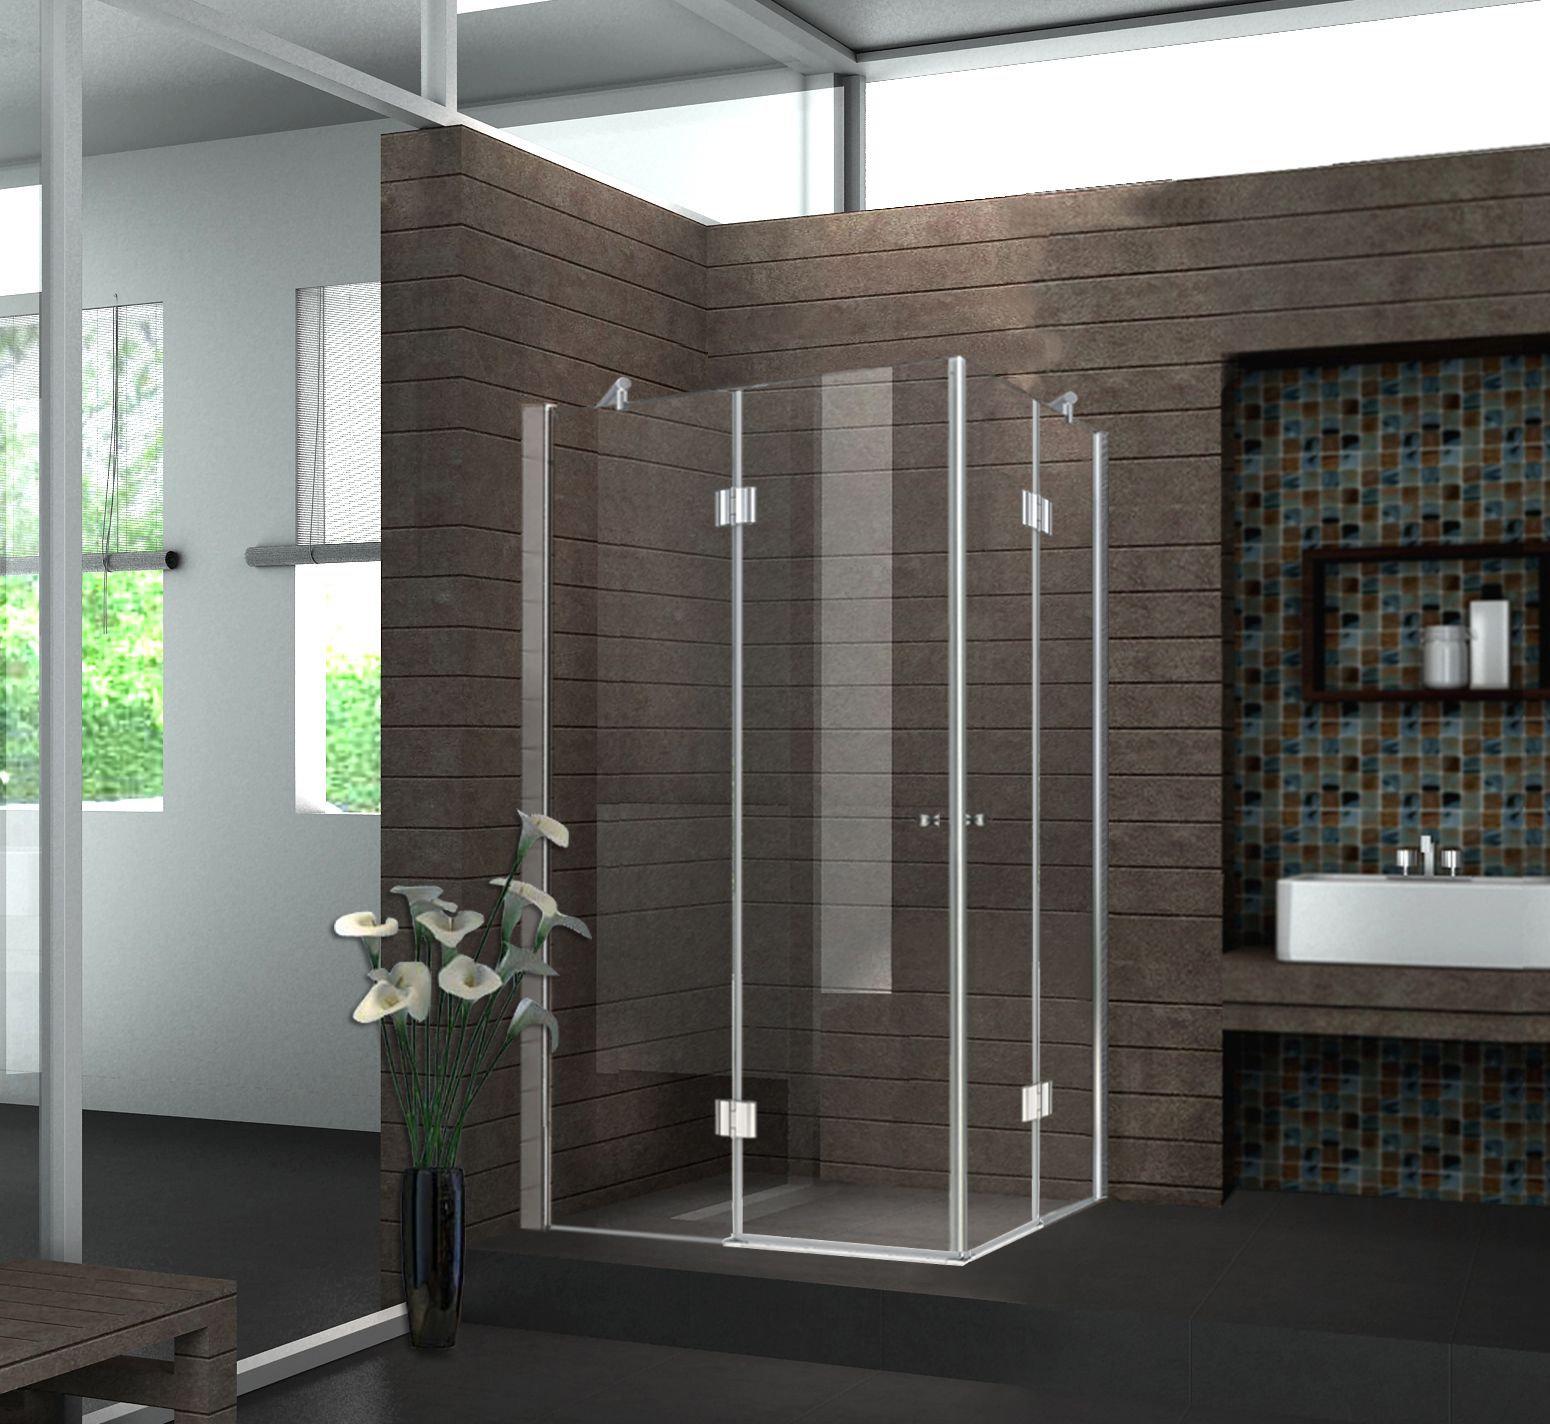 duschkabine corno 120 x 120 x 195 cm ohne duschtasse - glasdeals